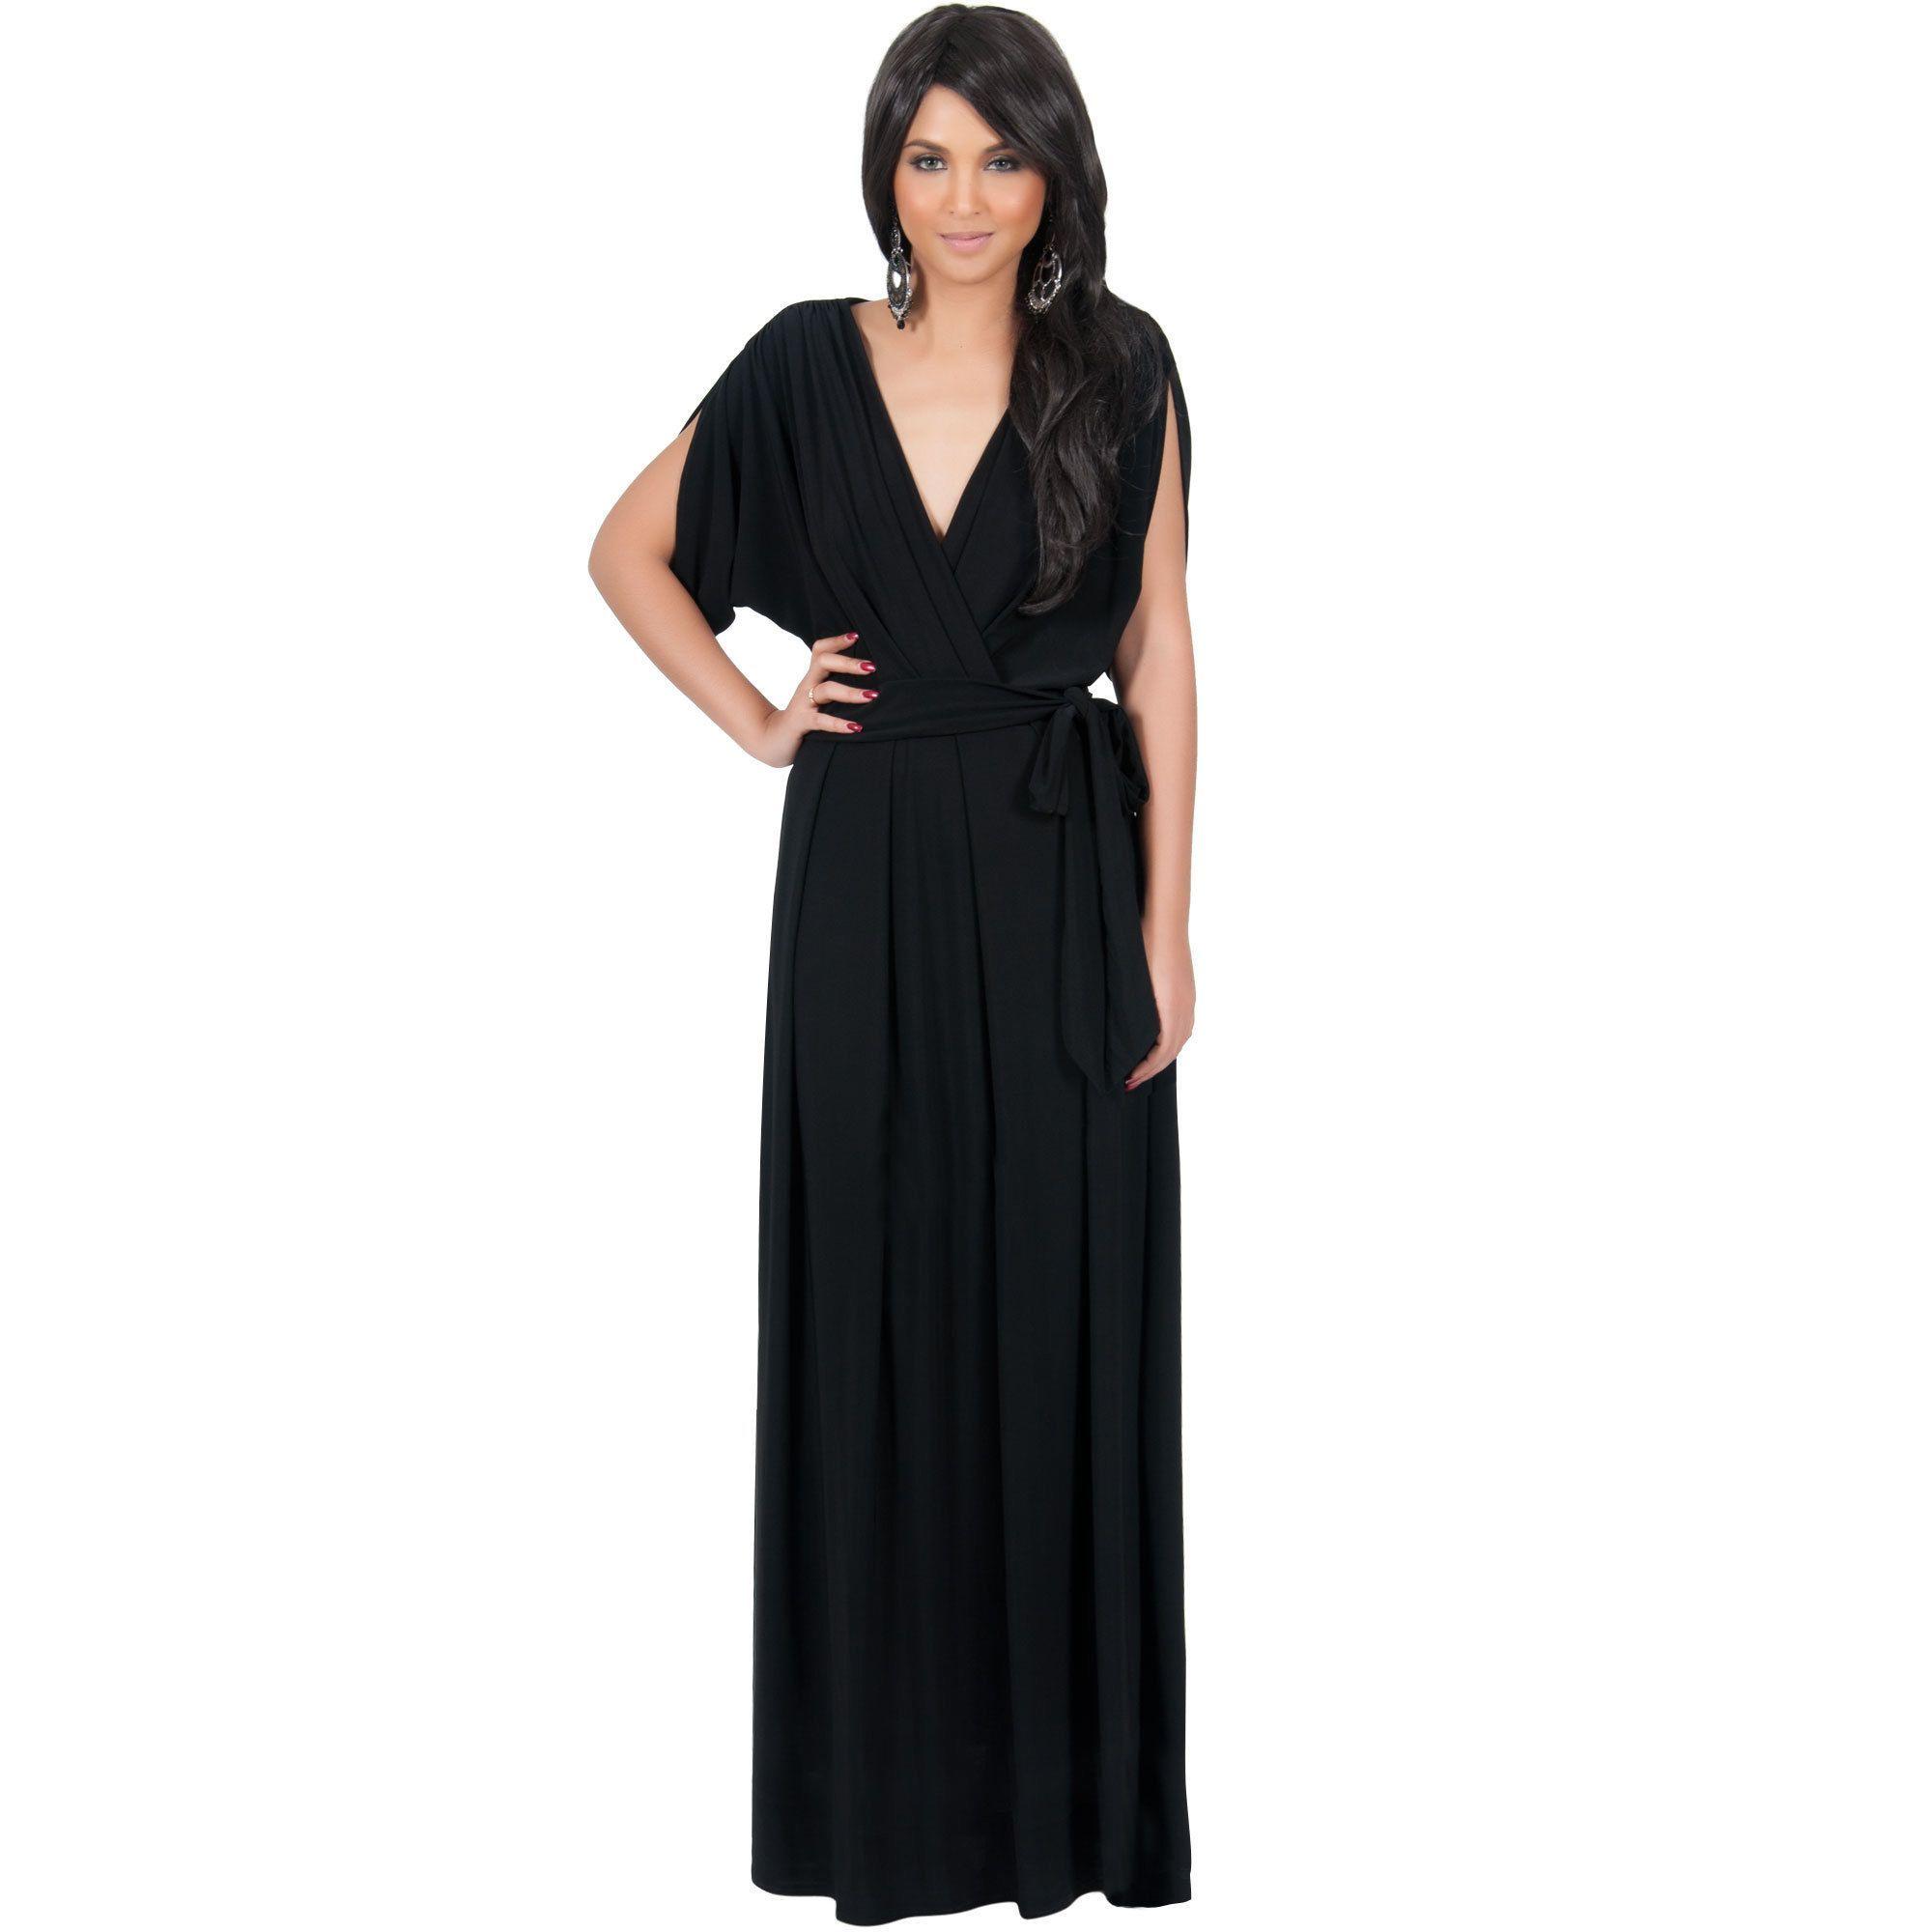 76bb697a5a5 Global Koh Koh Women s Batwing Dolman Sleeve Elegant Cocktail Gown Maxi  Dress